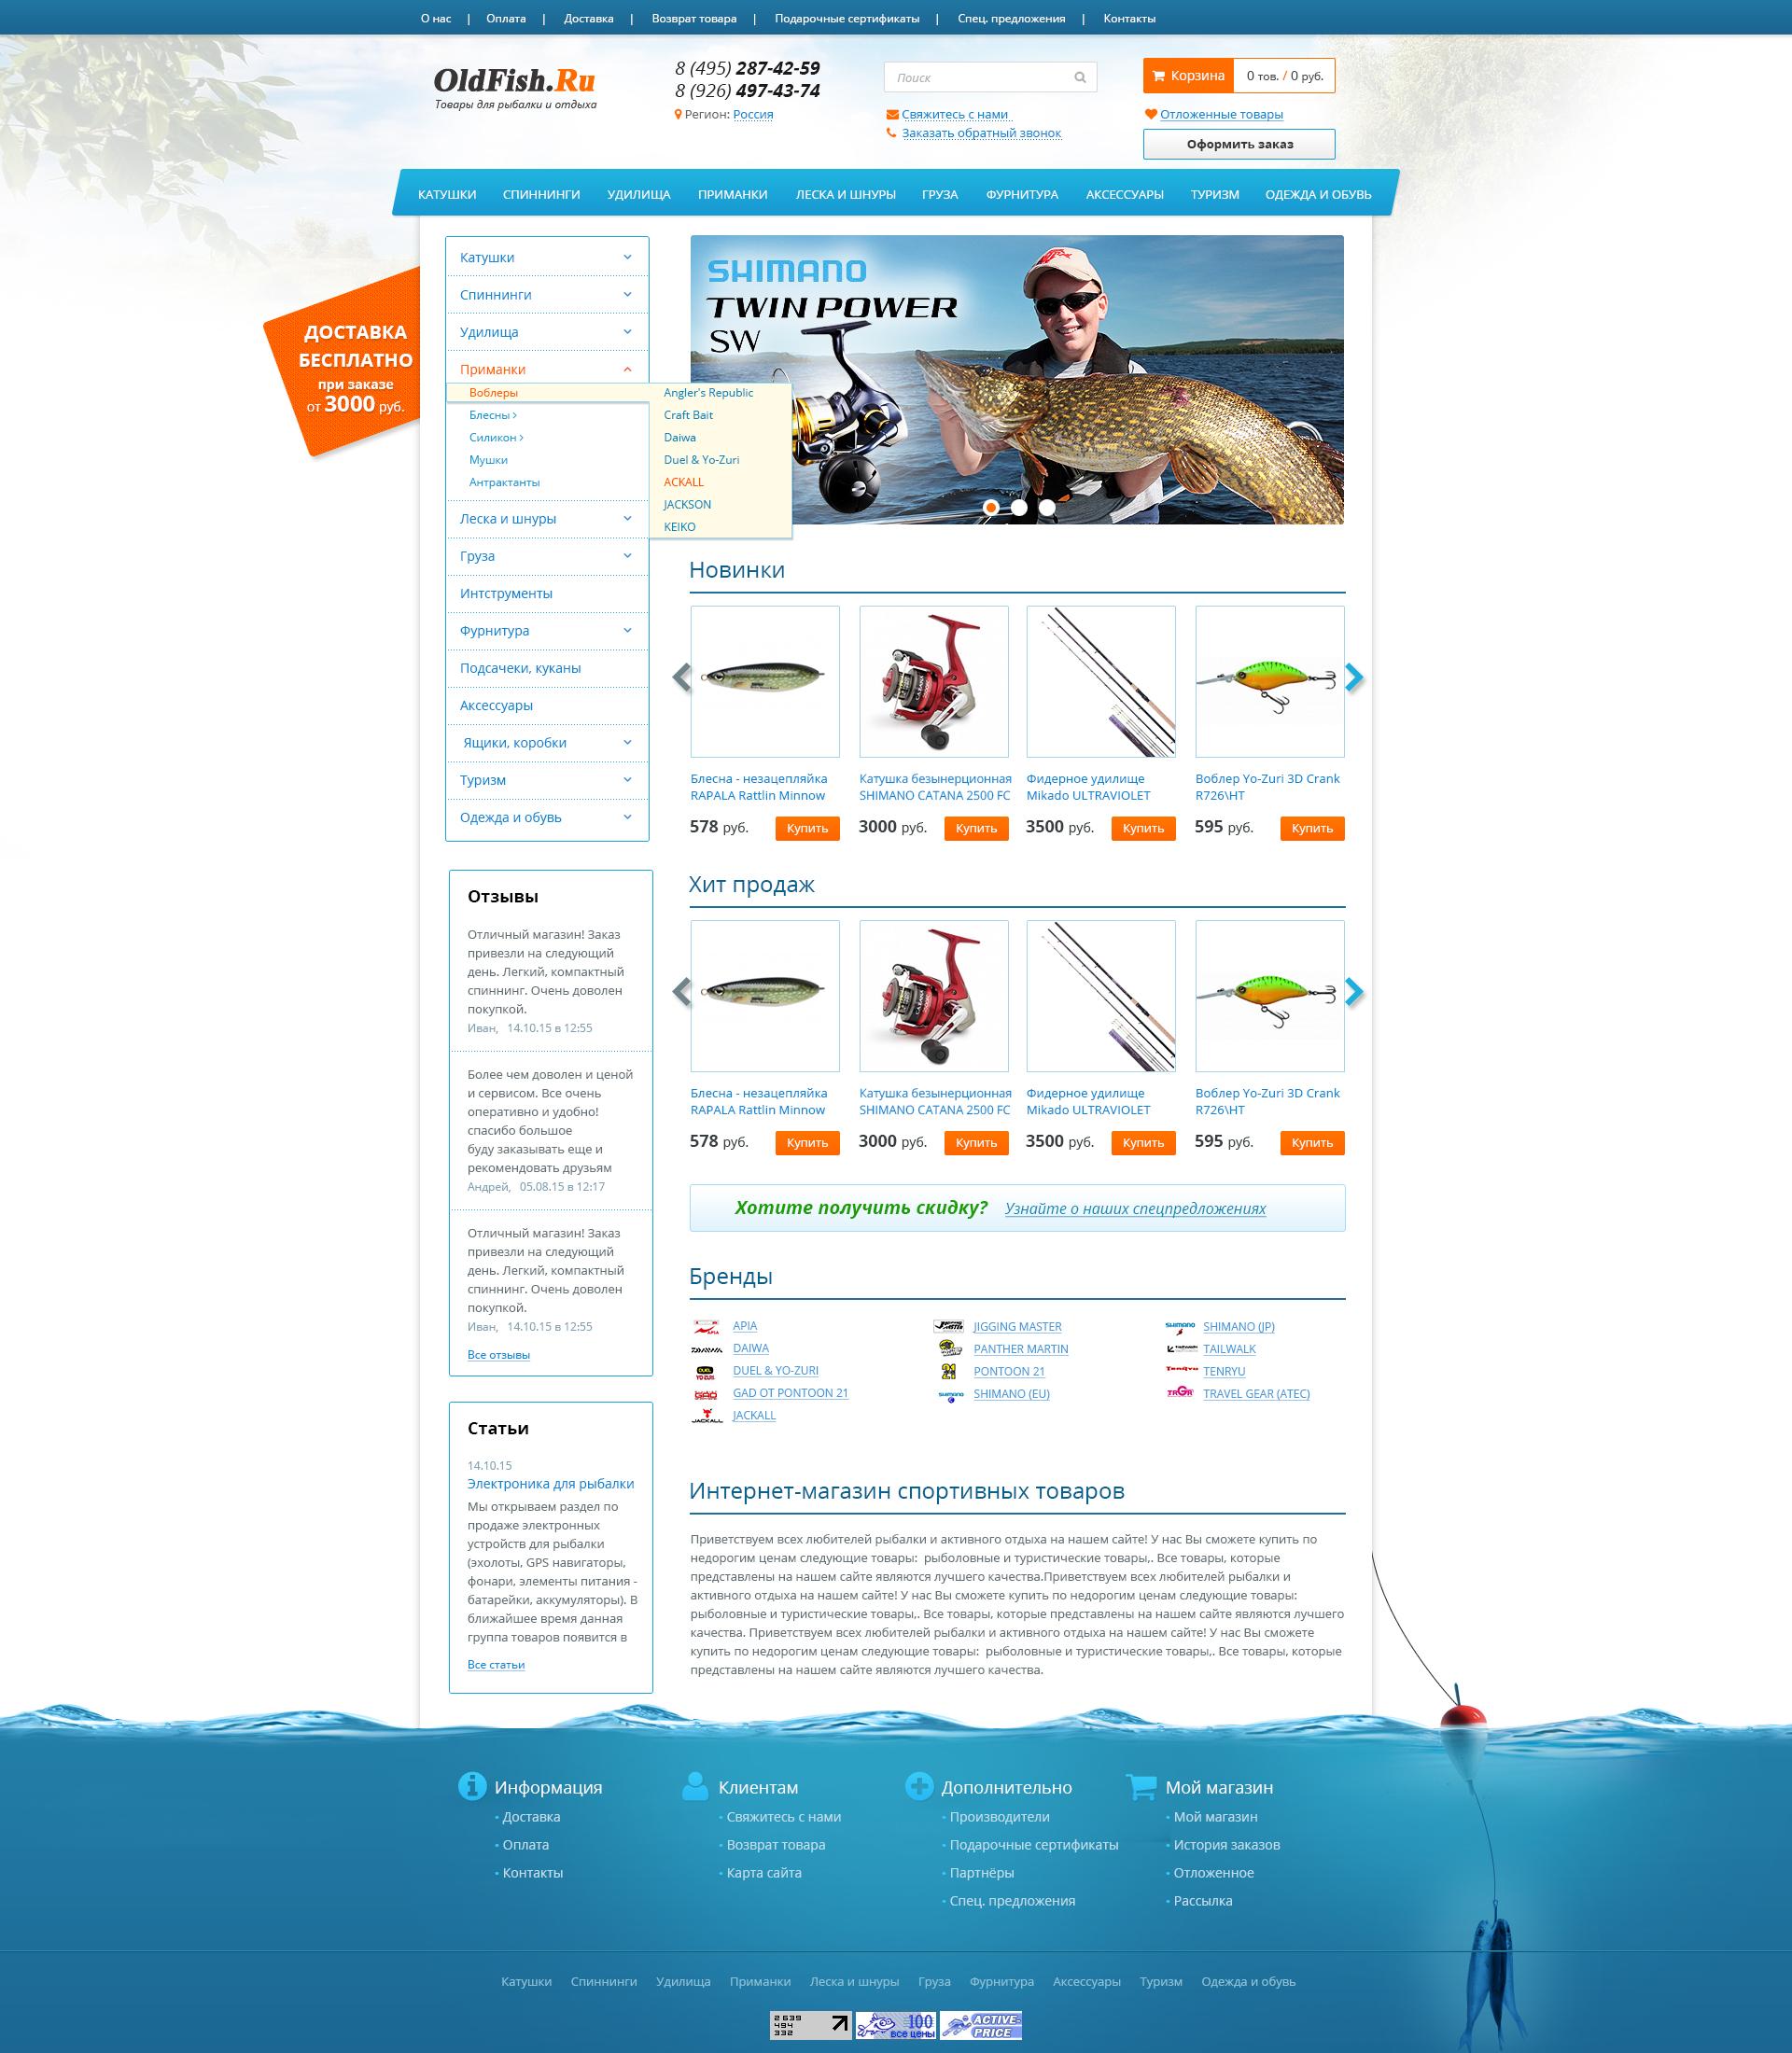 Редизайн сайта под ключ www.oldfish.ru в разработке